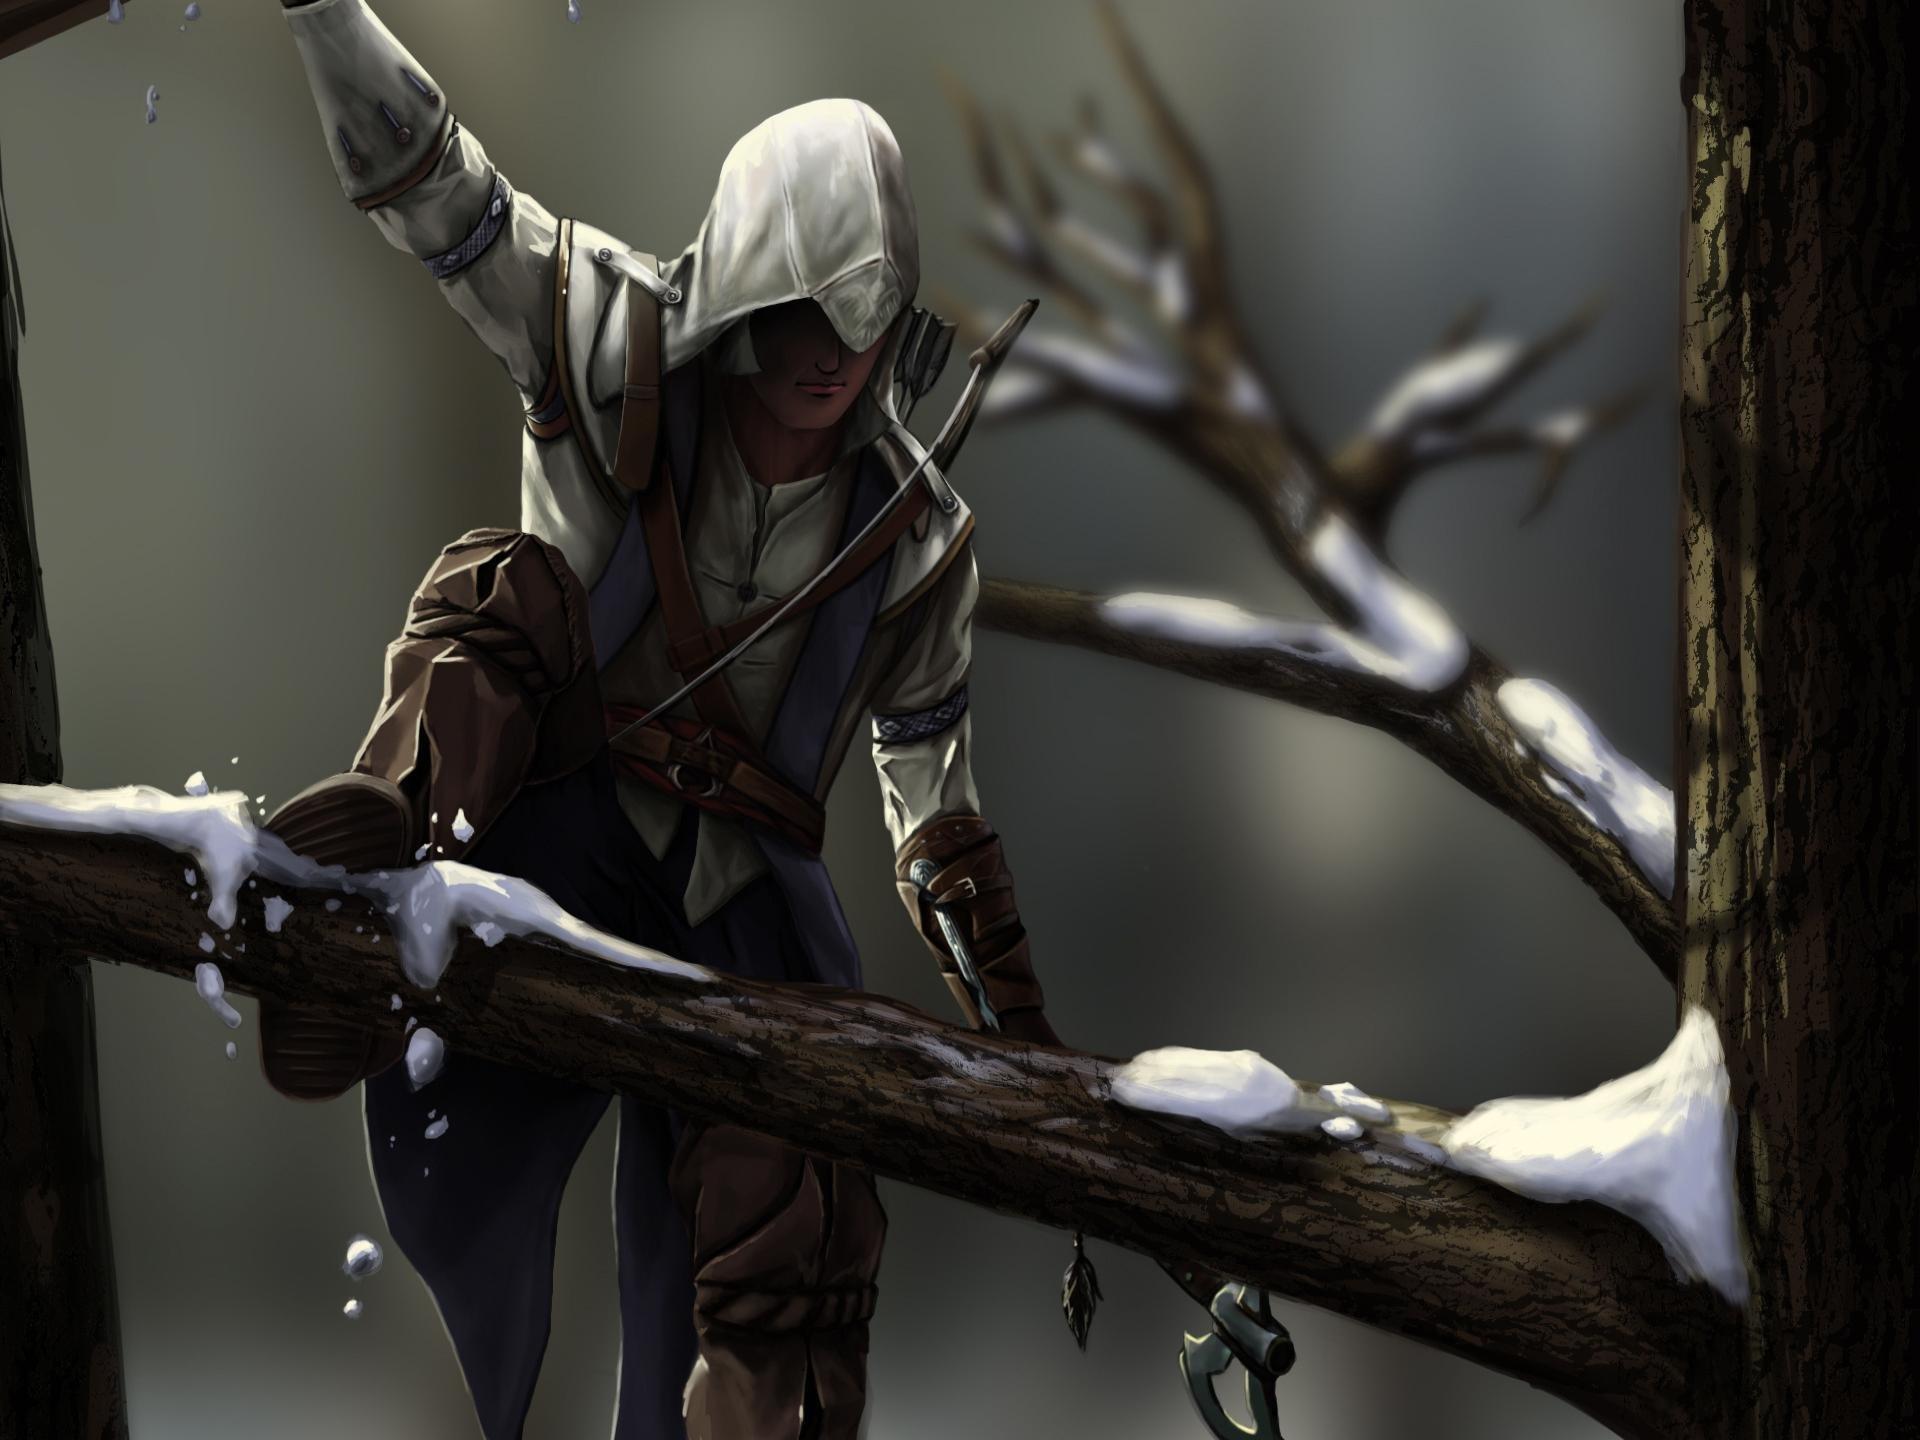 Download Hd 1920x1440 Assassin S Creed 3 Pc Wallpaper Id 447294